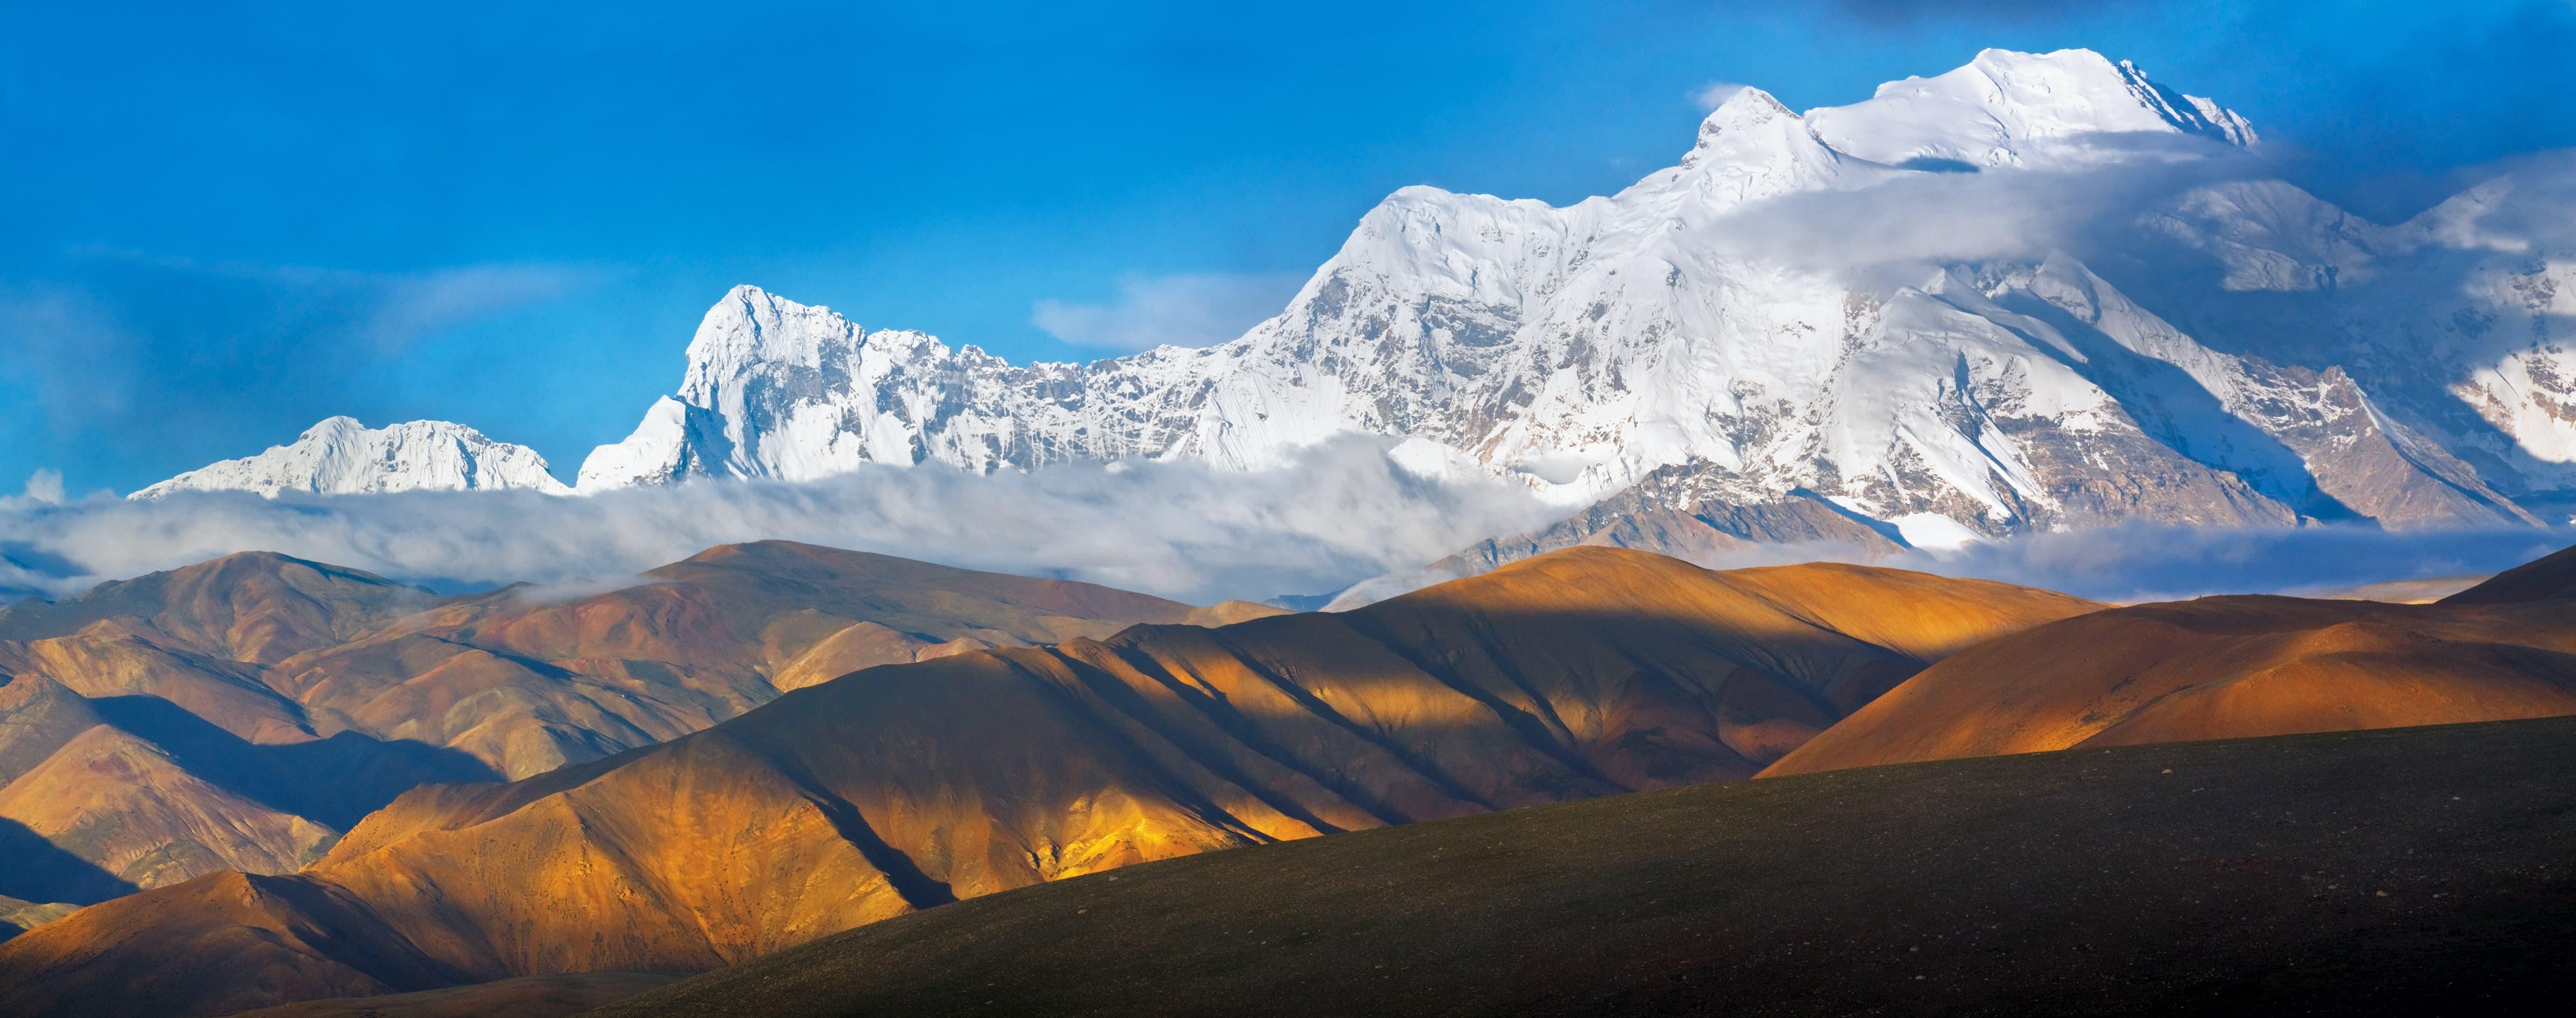 Panorama of the Shishapangma Mountain in Tibet